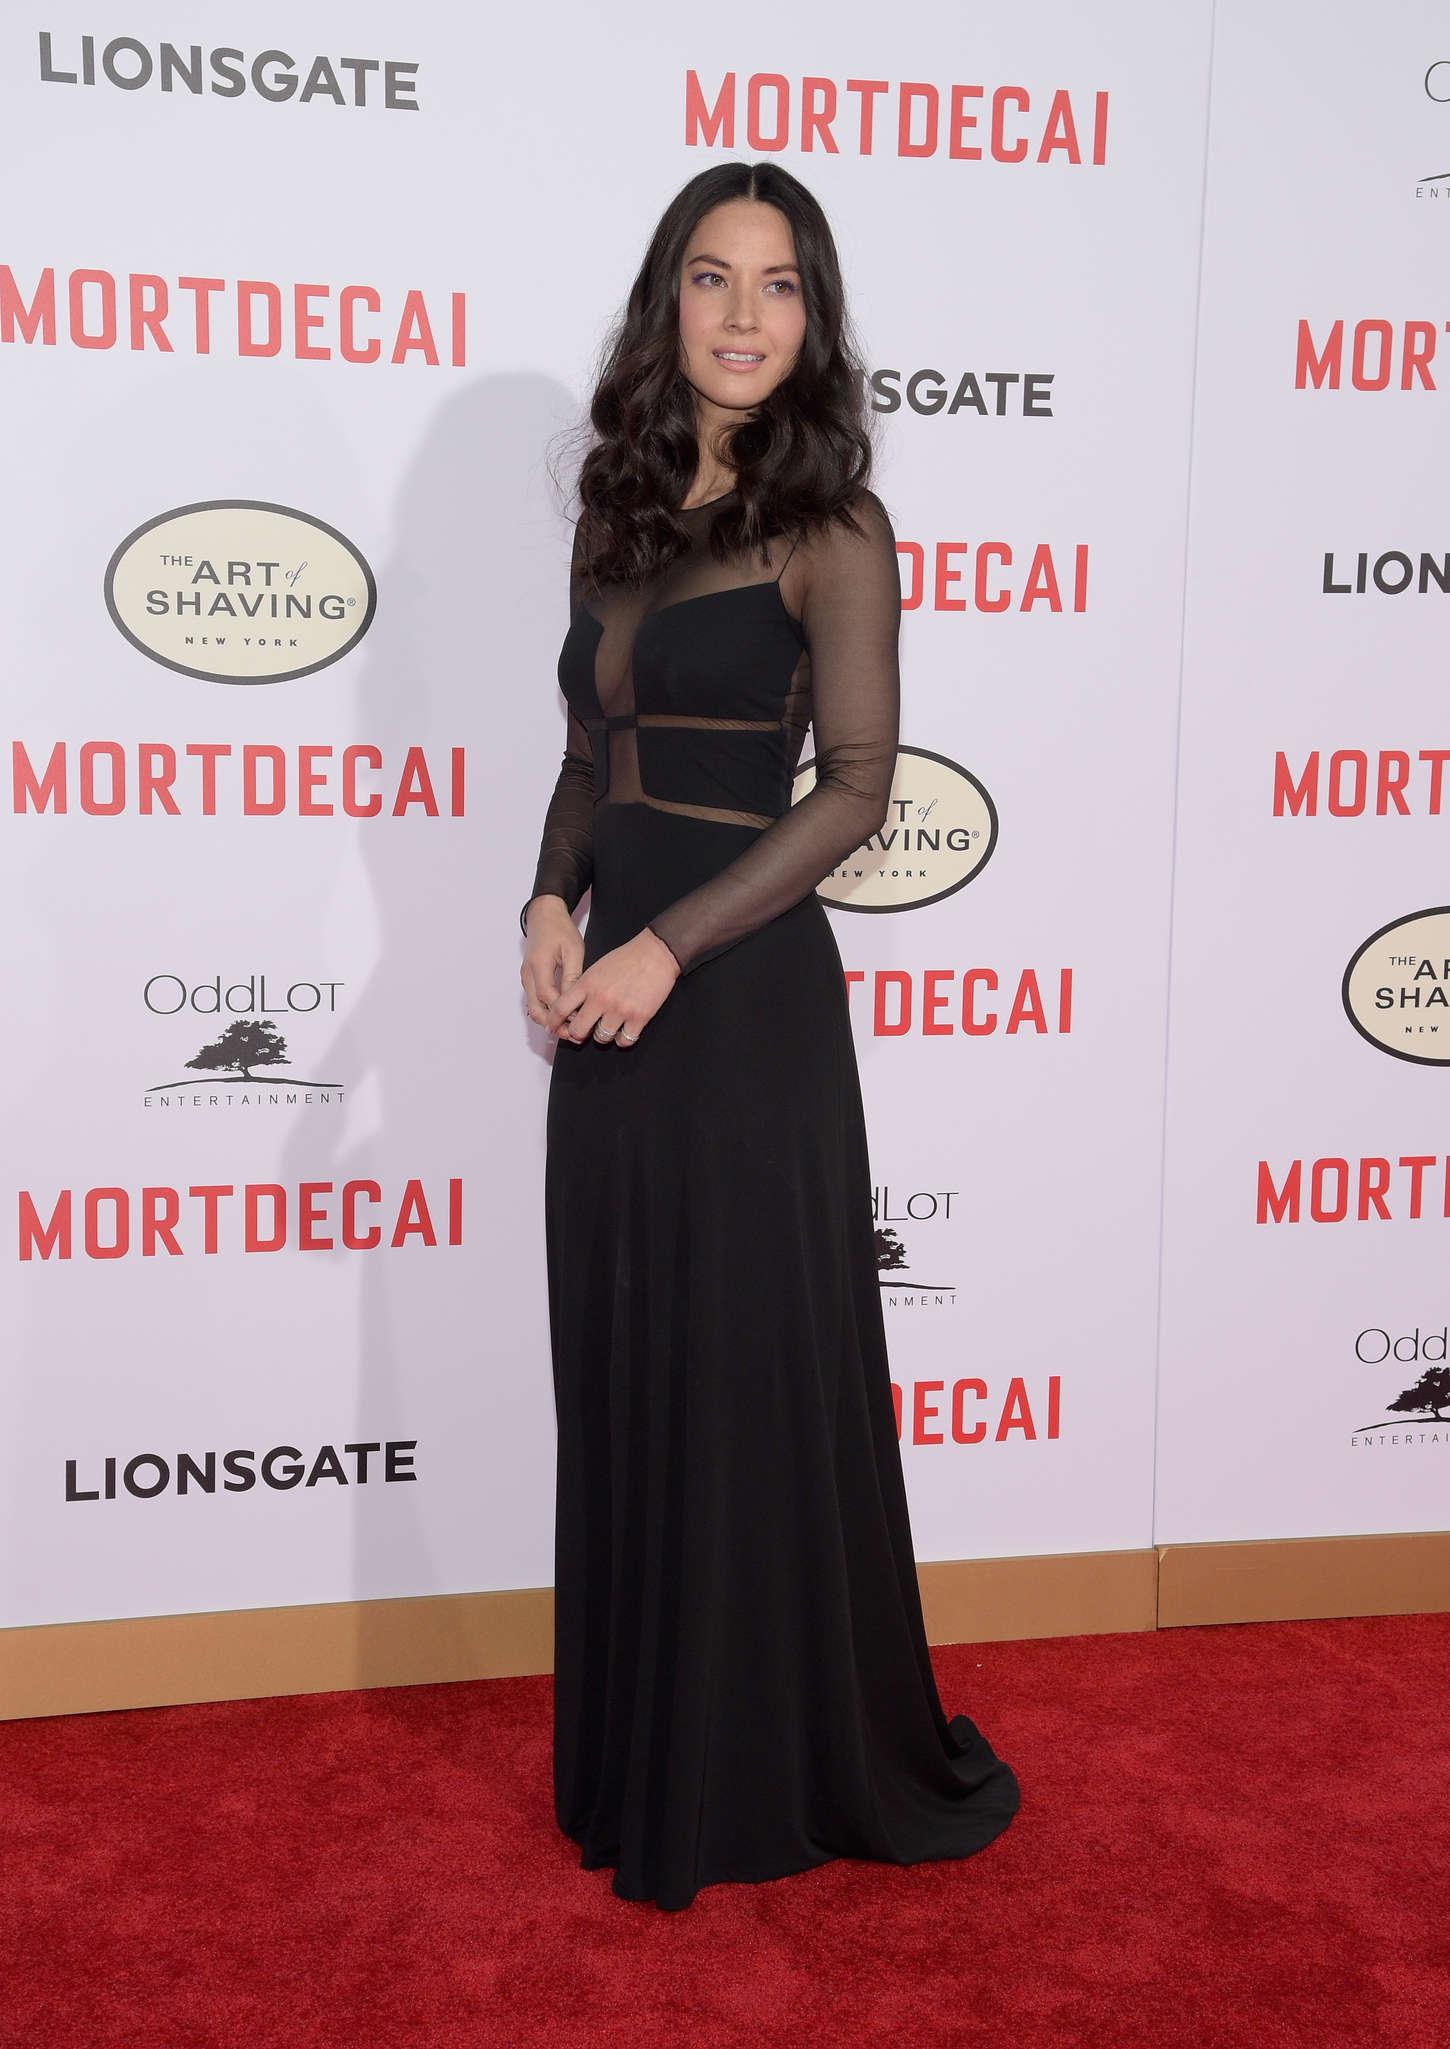 Olivia Munn 2015 : Olivia Munn: Mortdecai LA Premiere -17